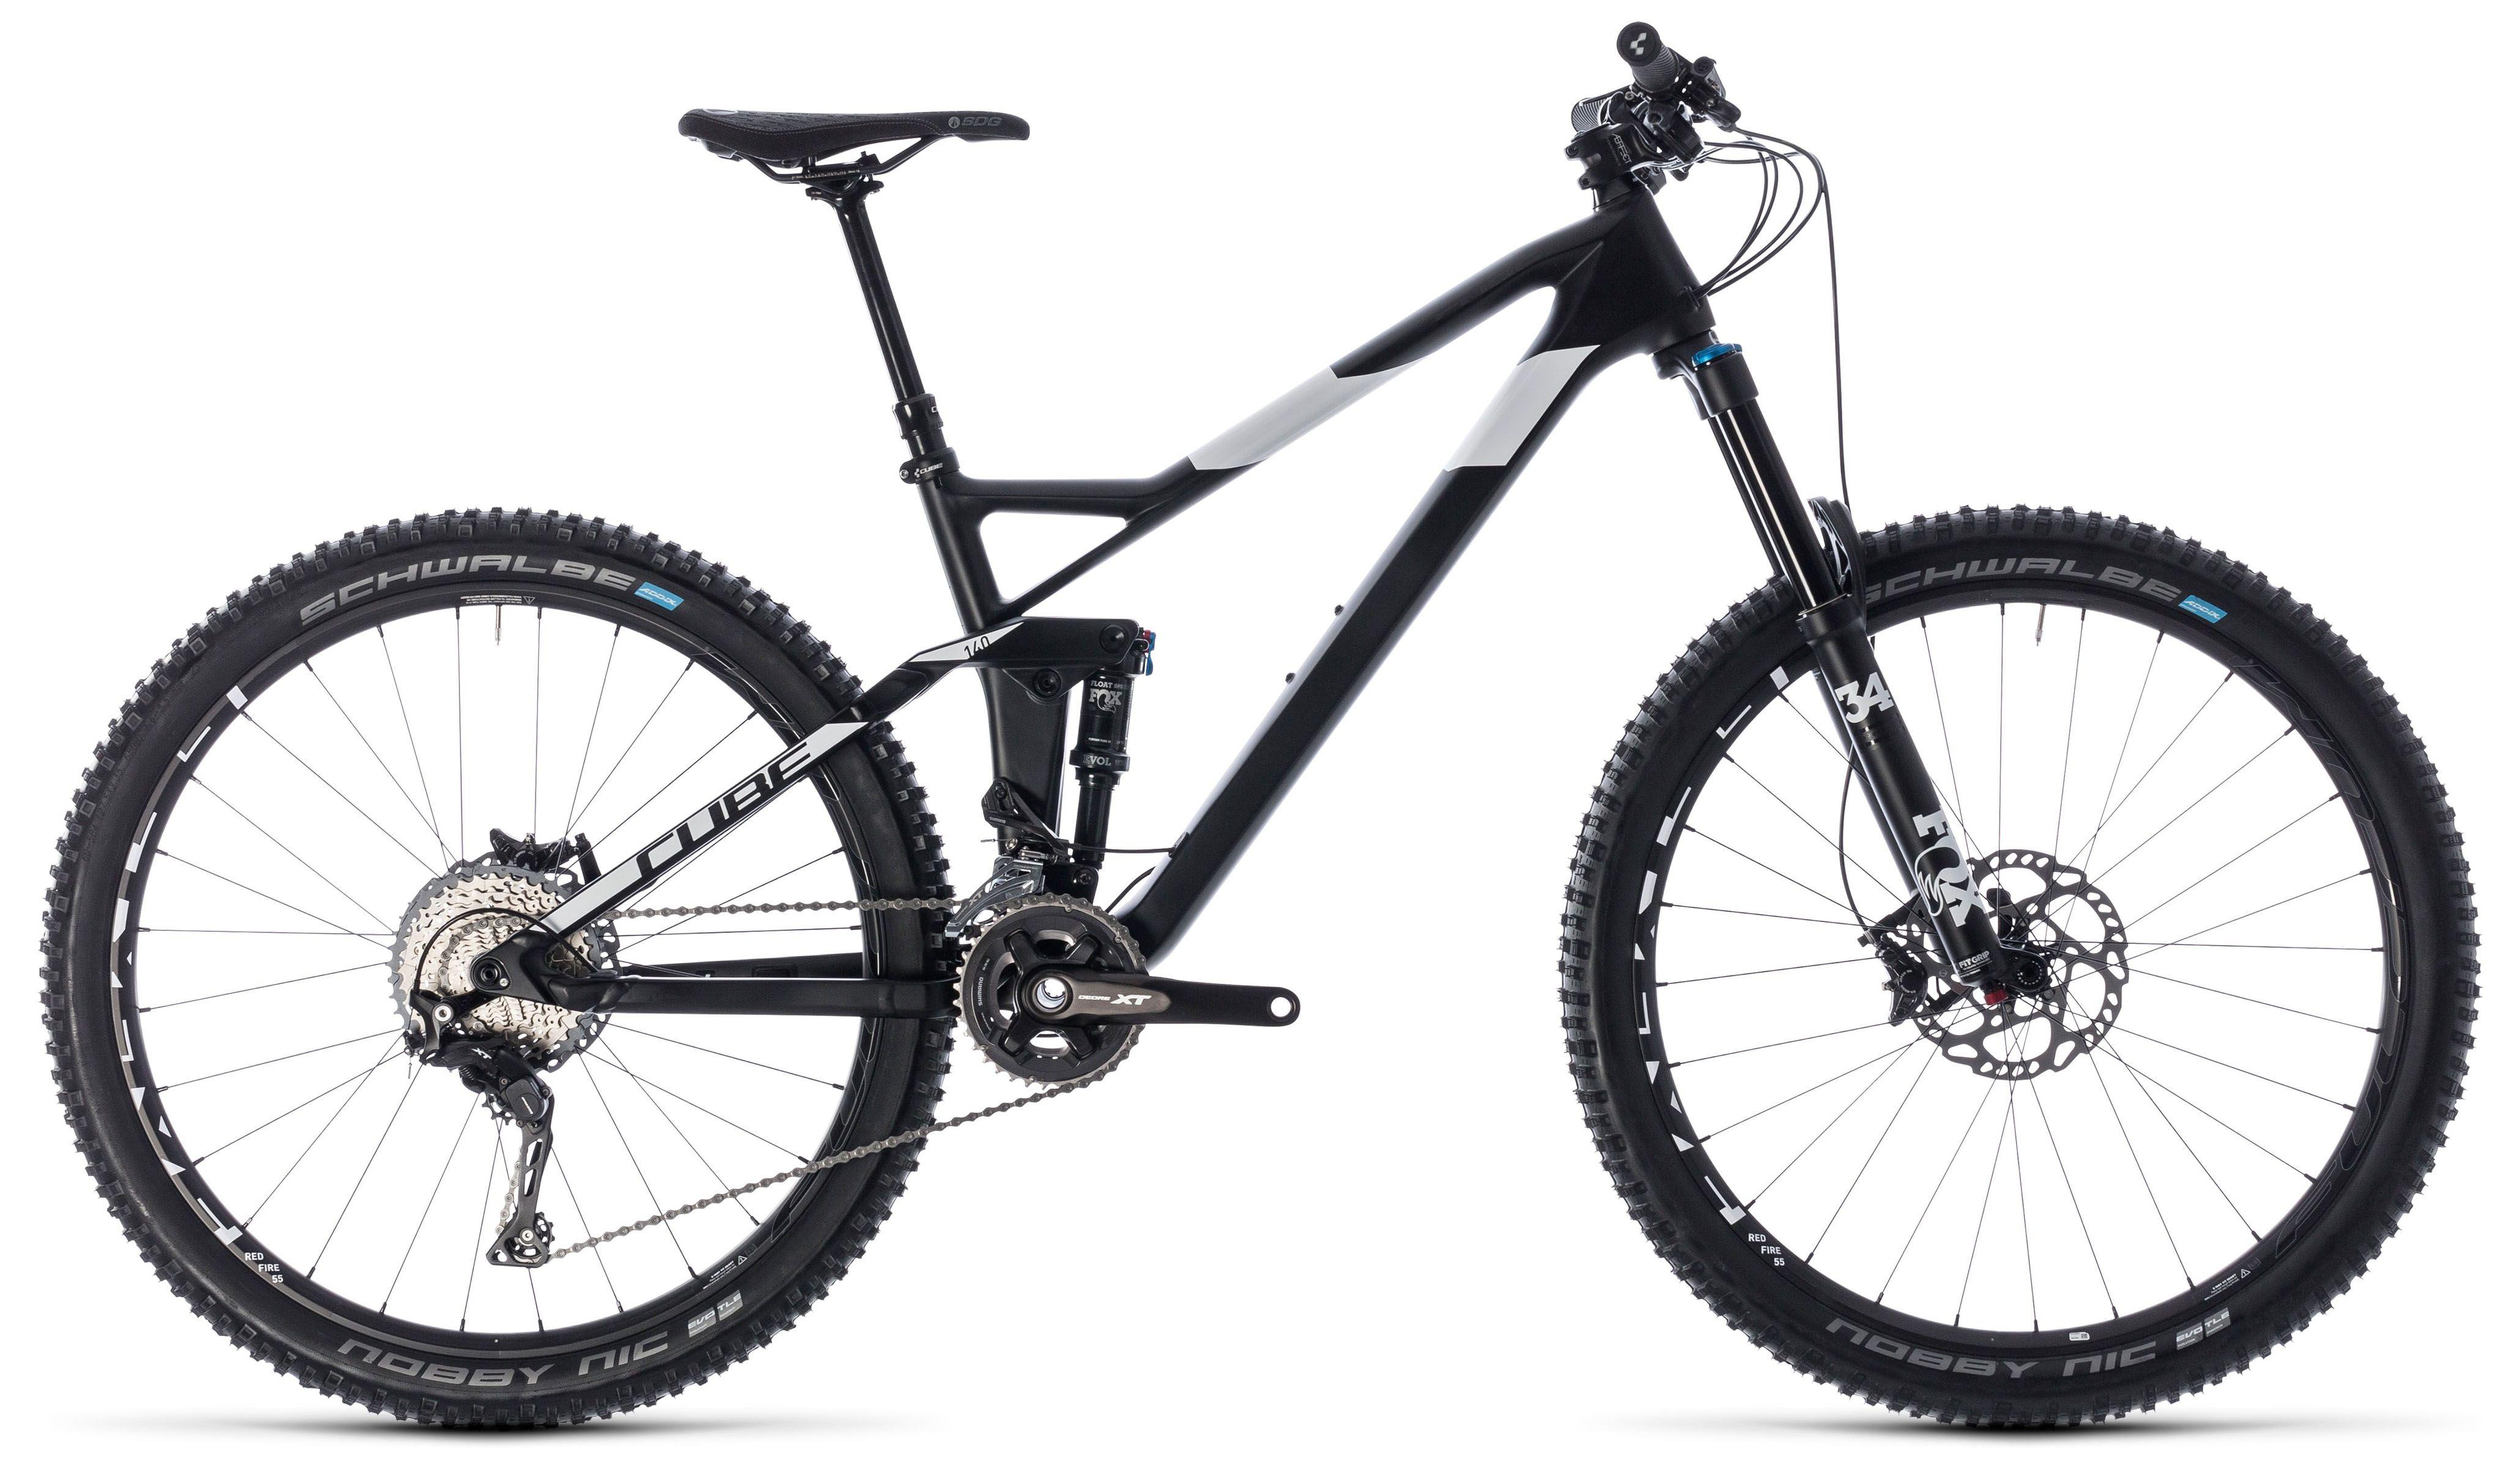 Велосипед Cube Stereo 140 HPC SL 27.5 2018 велосипед cube stereo 140 super hpc sl 29 2014